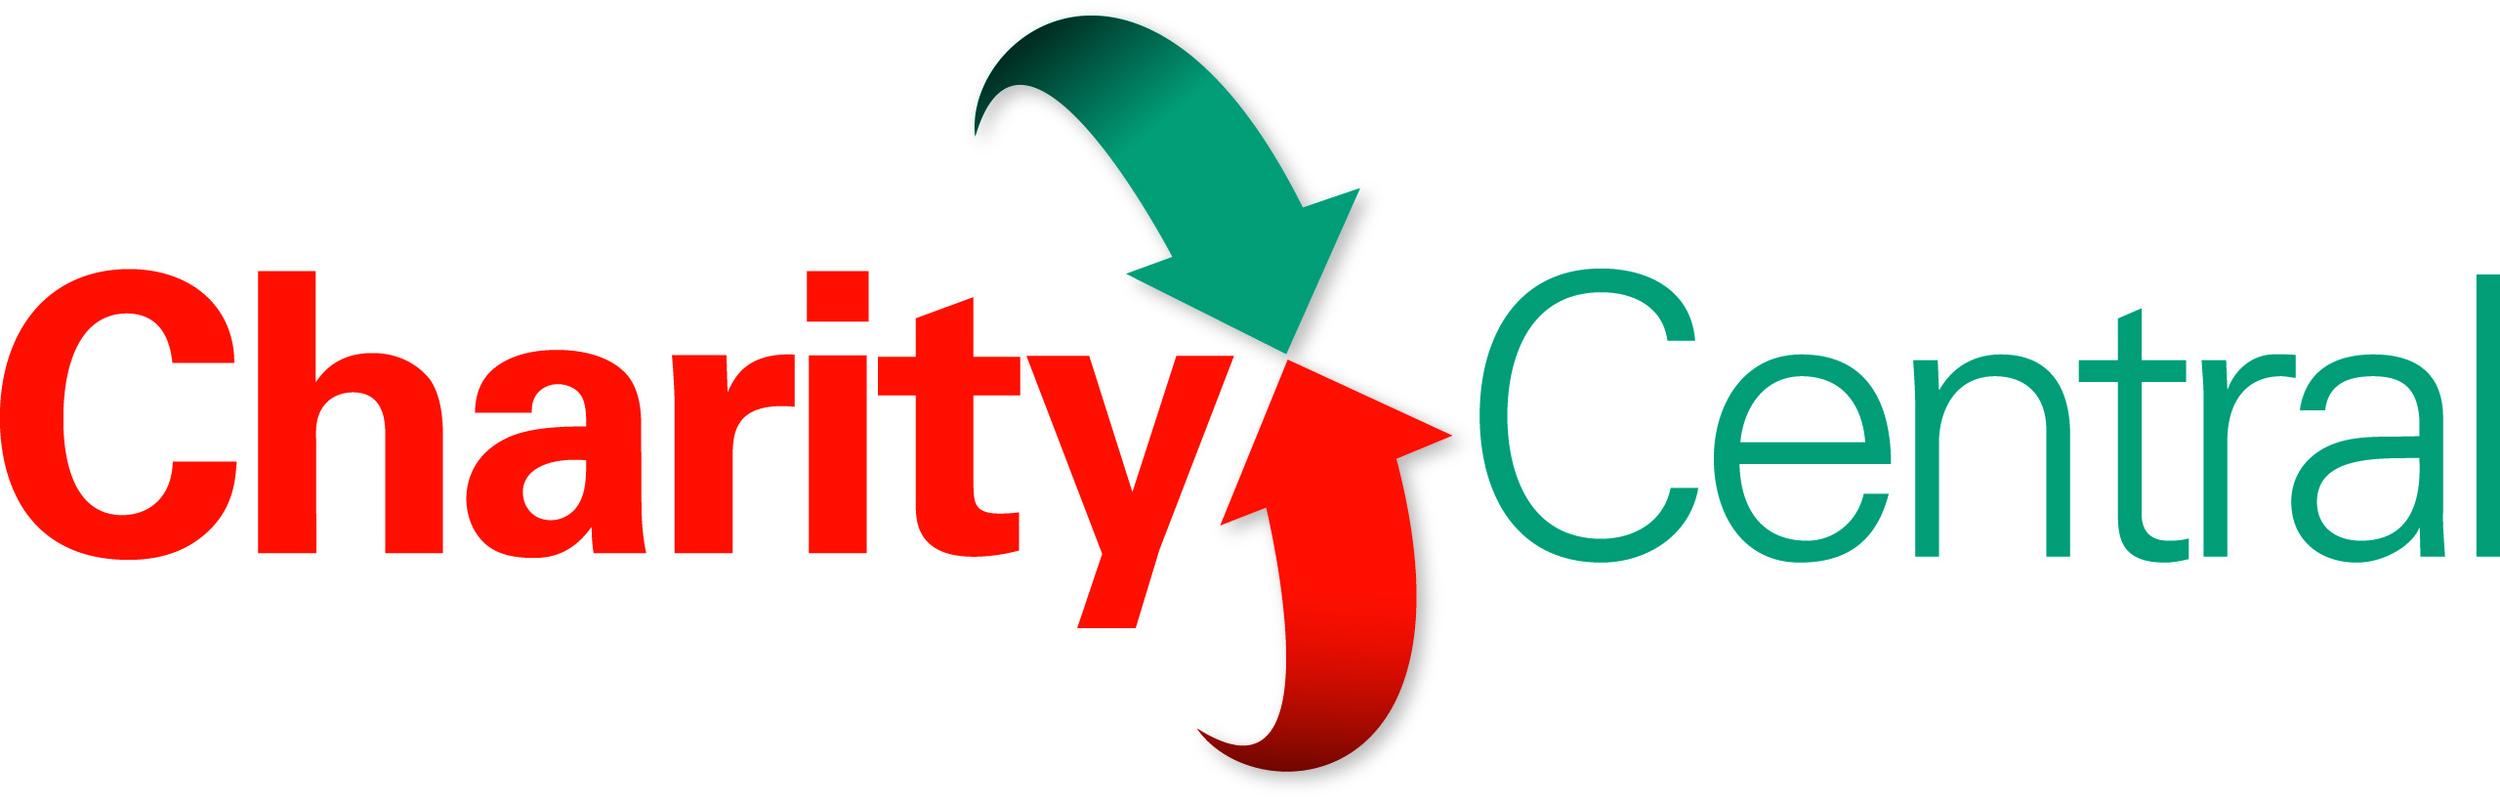 CharityCentral_logo.jpg